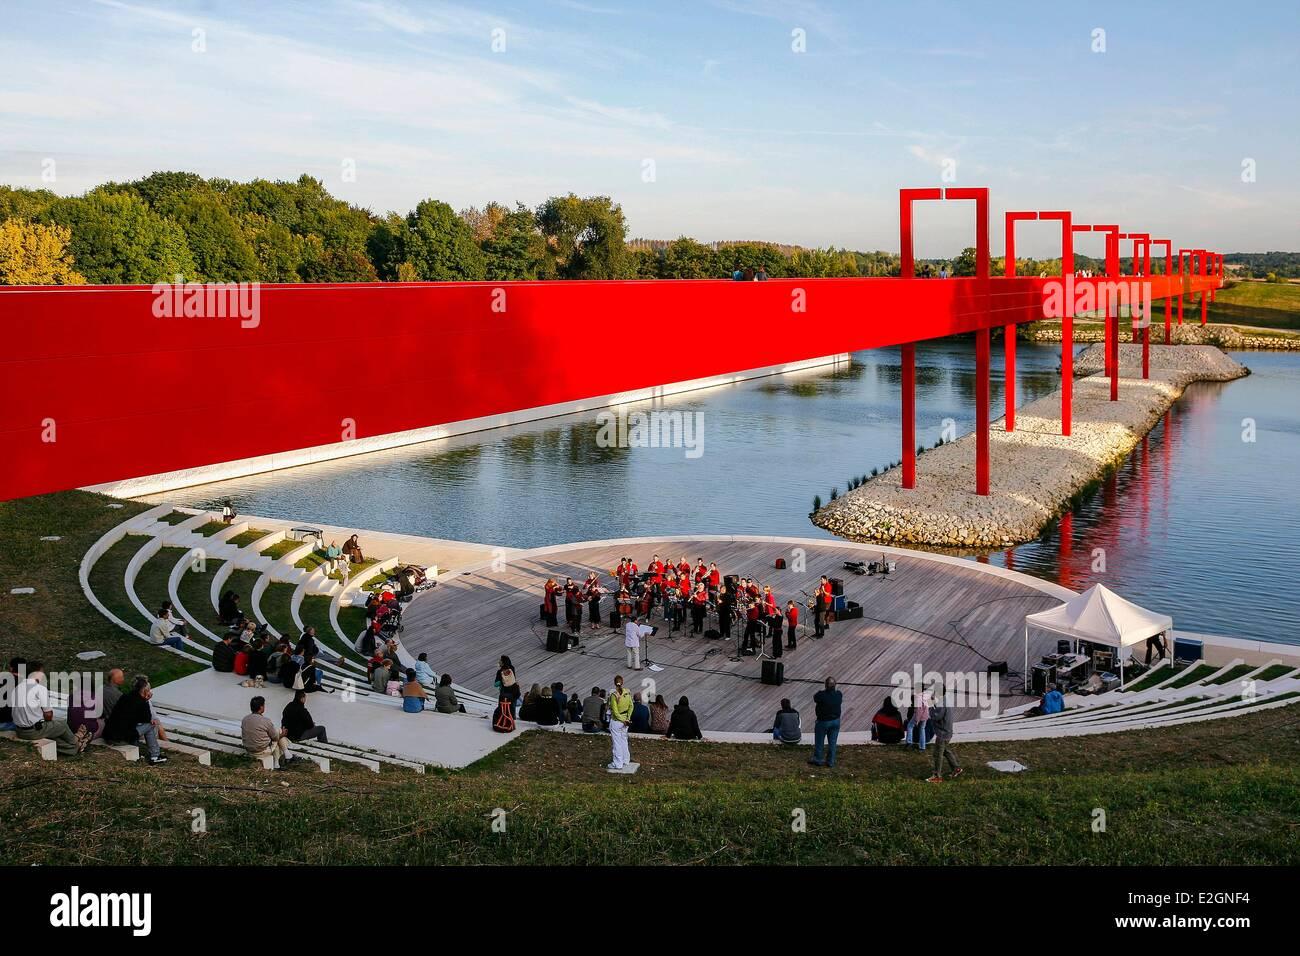 France val d 39 oise cergy axe majeur monumental work - Piscine cergy axe majeur ...